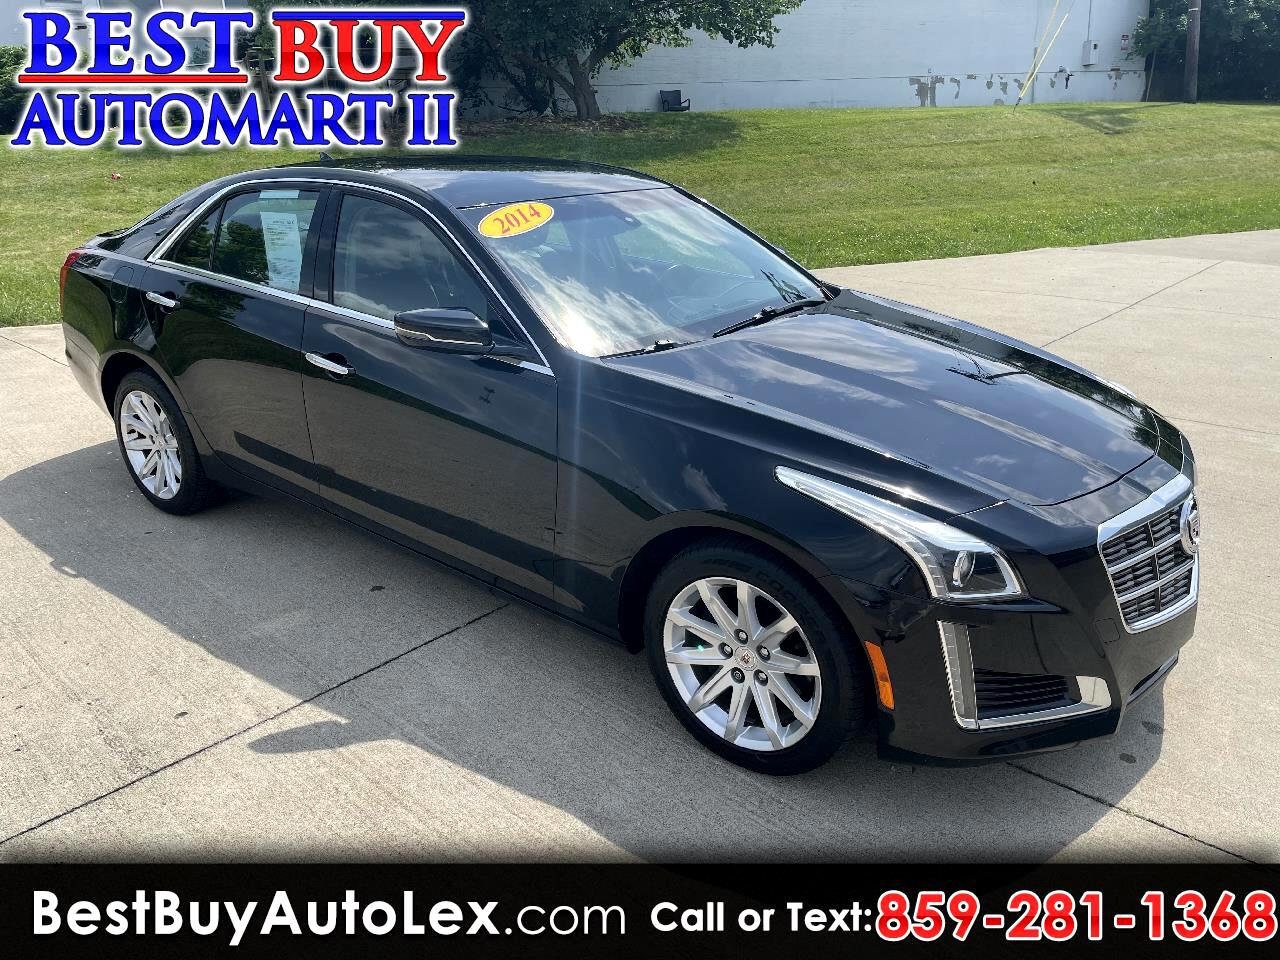 Cadillac CTS 2.0L Turbo AWD 2014